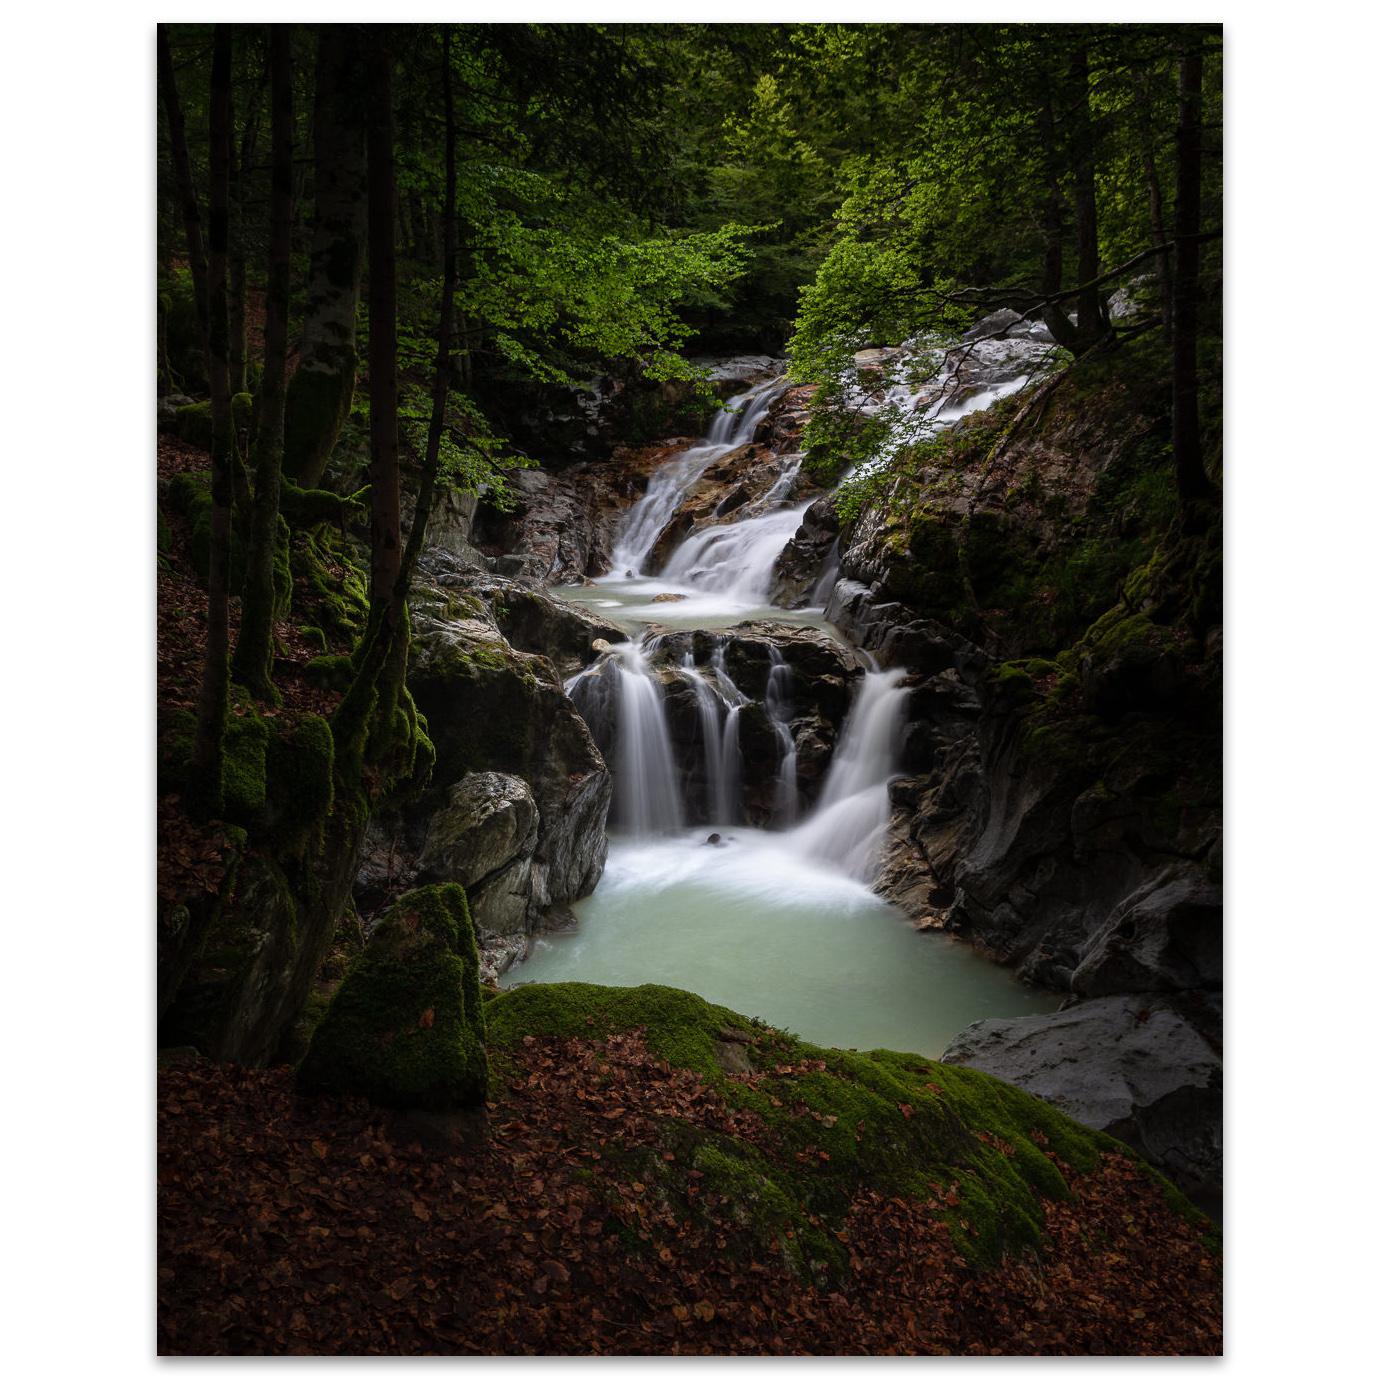 The Bious Waterfalls